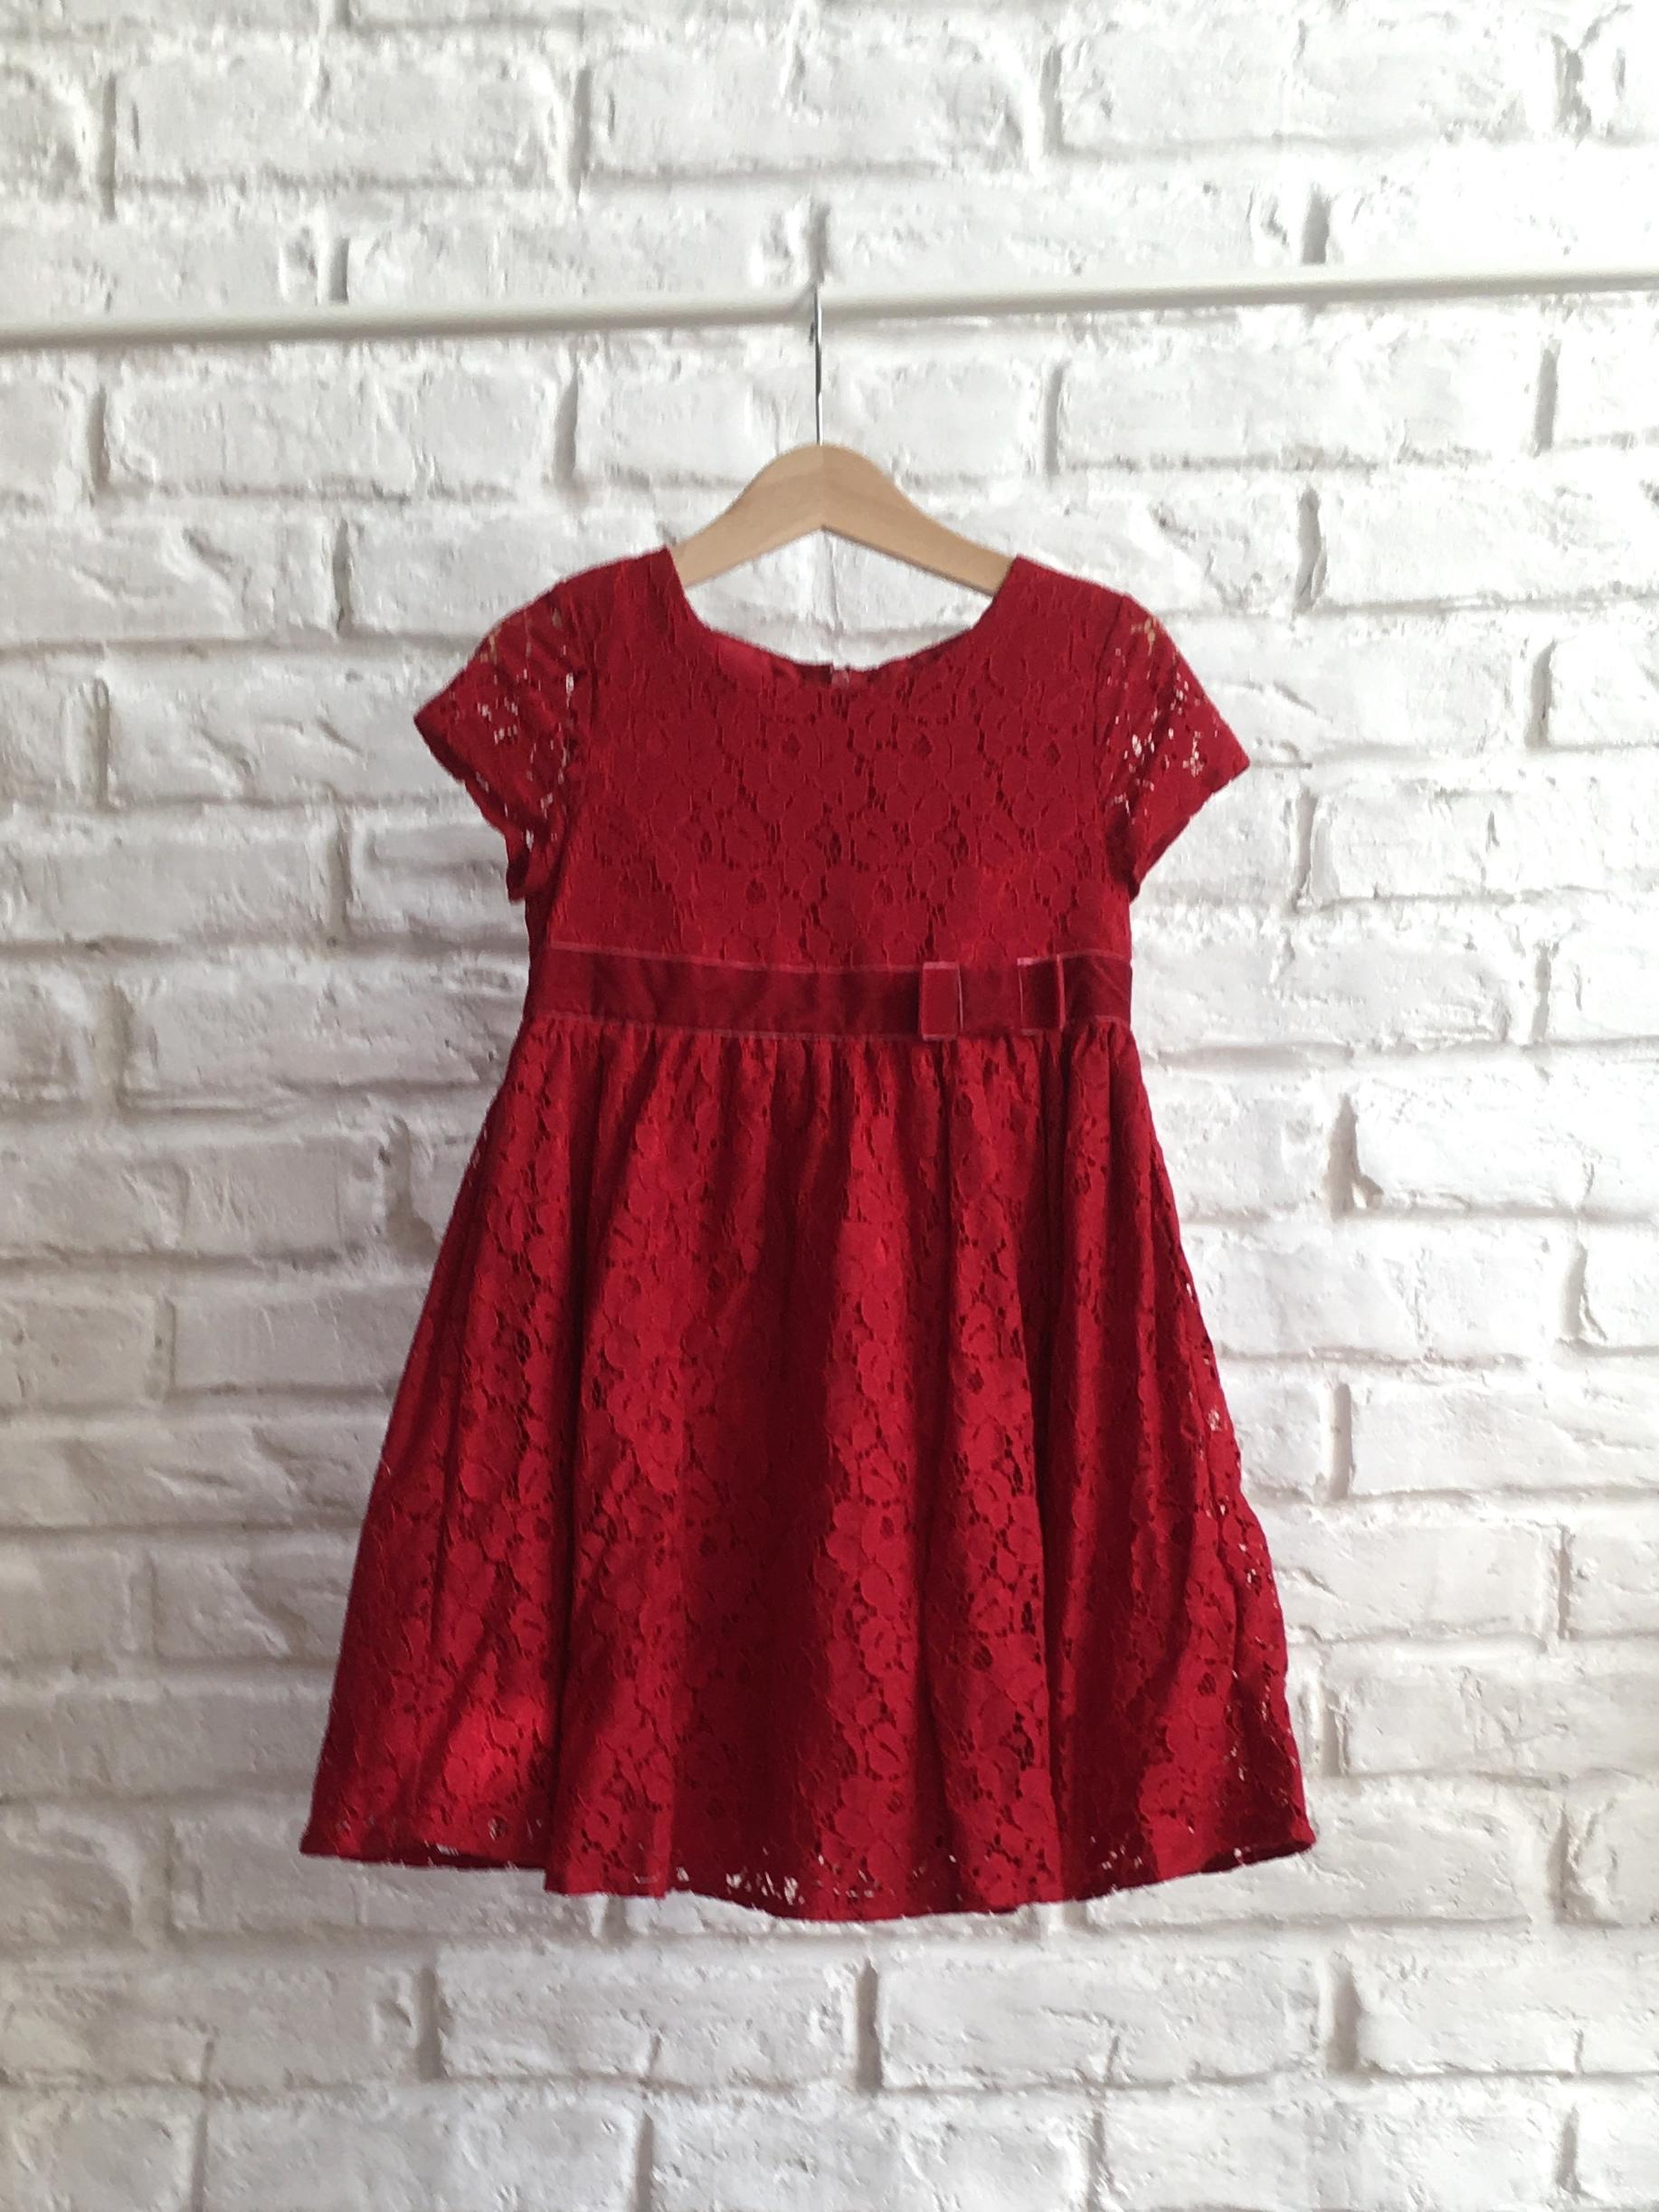 c7d5c91c9c Červené čipkované šaty Lindex - Bazár Veronika - Morský Koník